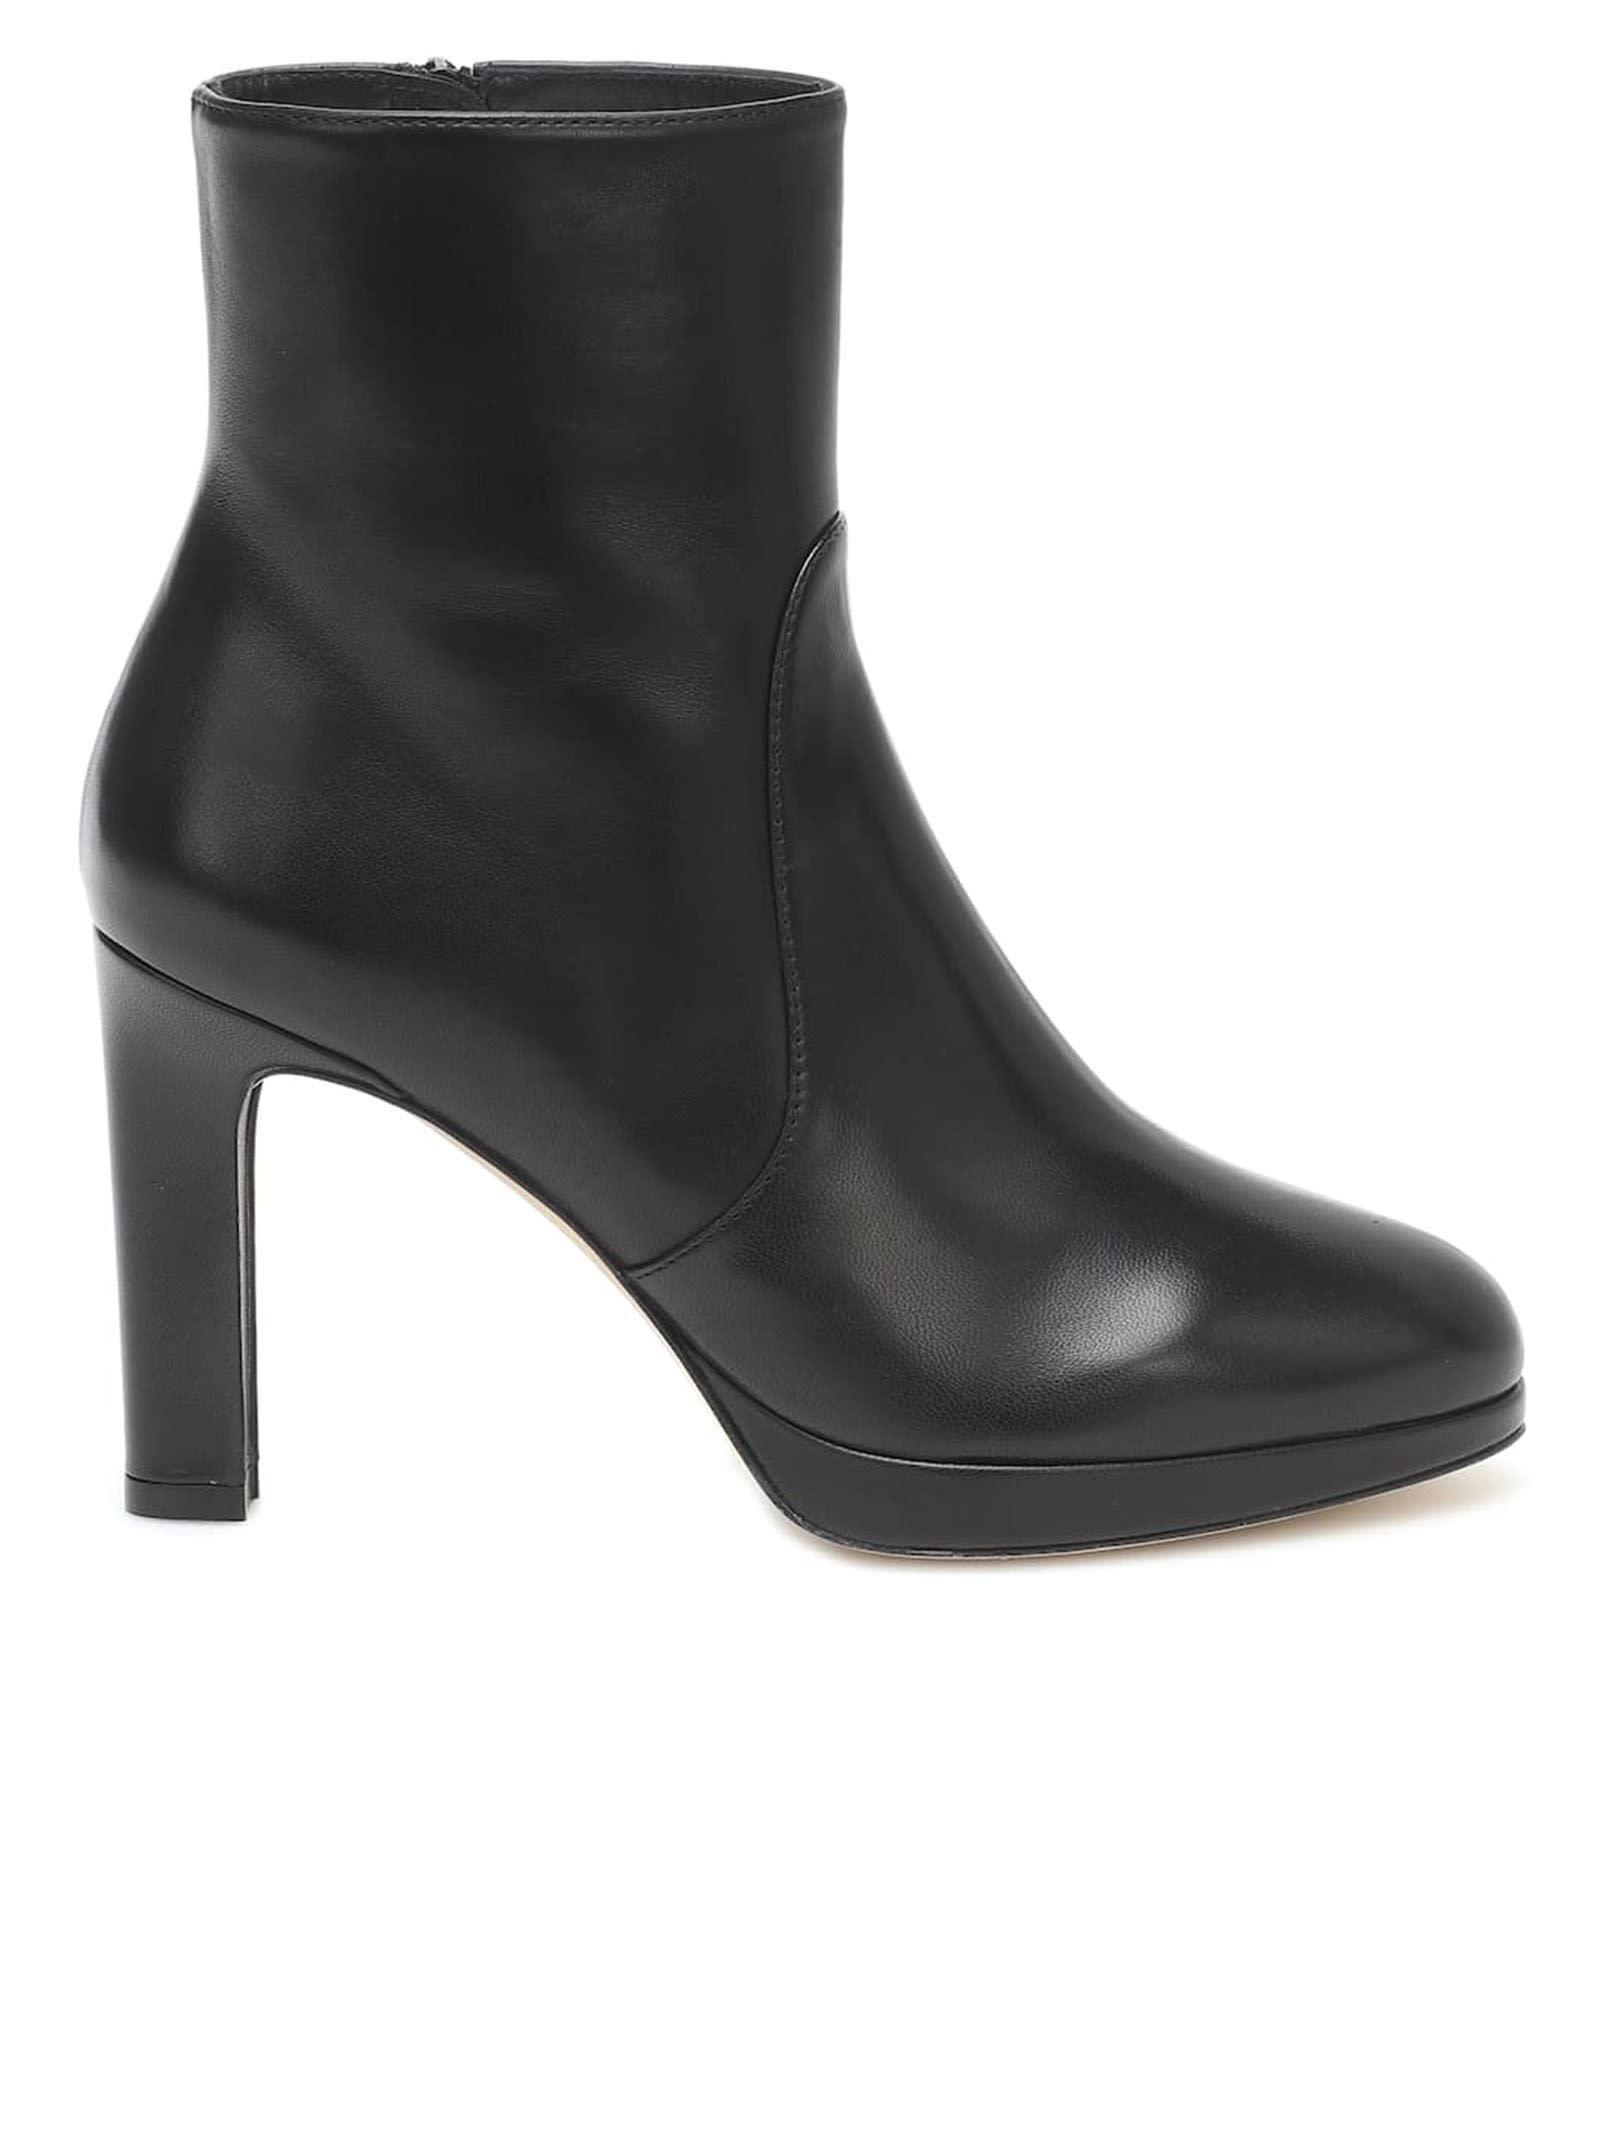 Buy Stuart Weitzman 5051 Black Leather Alani Ankle Boots online, shop Stuart Weitzman shoes with free shipping